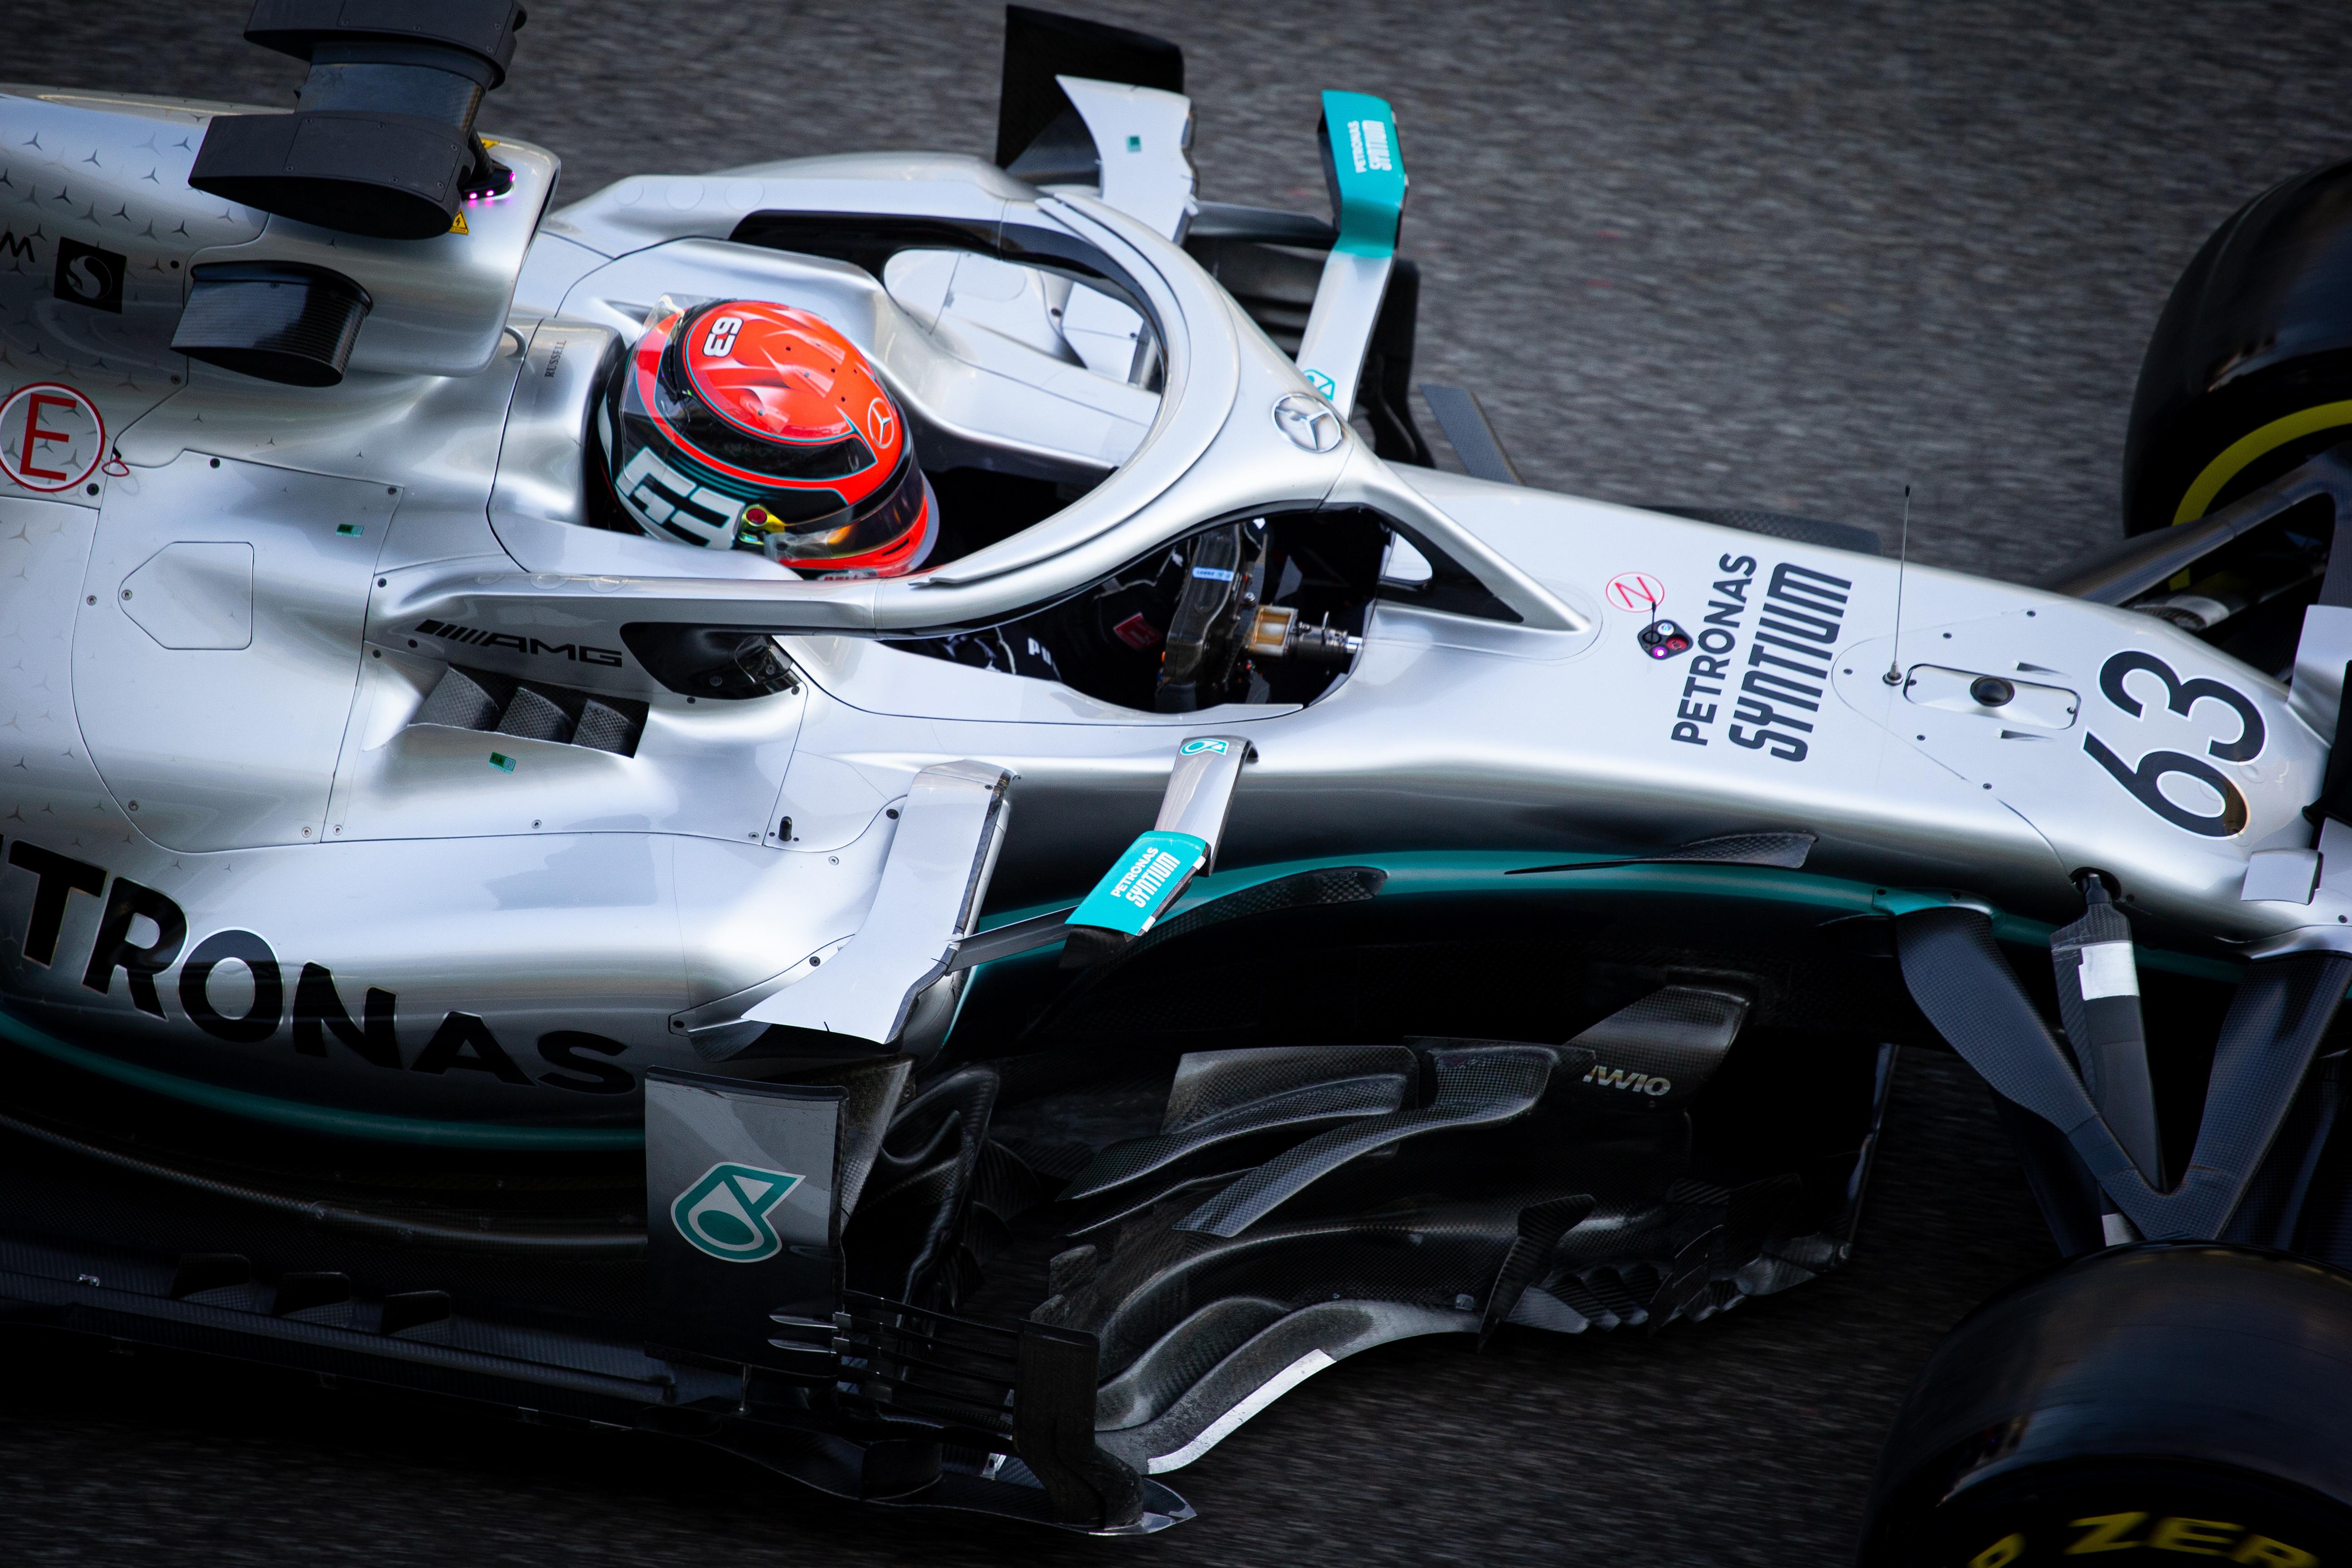 George Russell Mercedes Abu Dhabi F1 test 2019